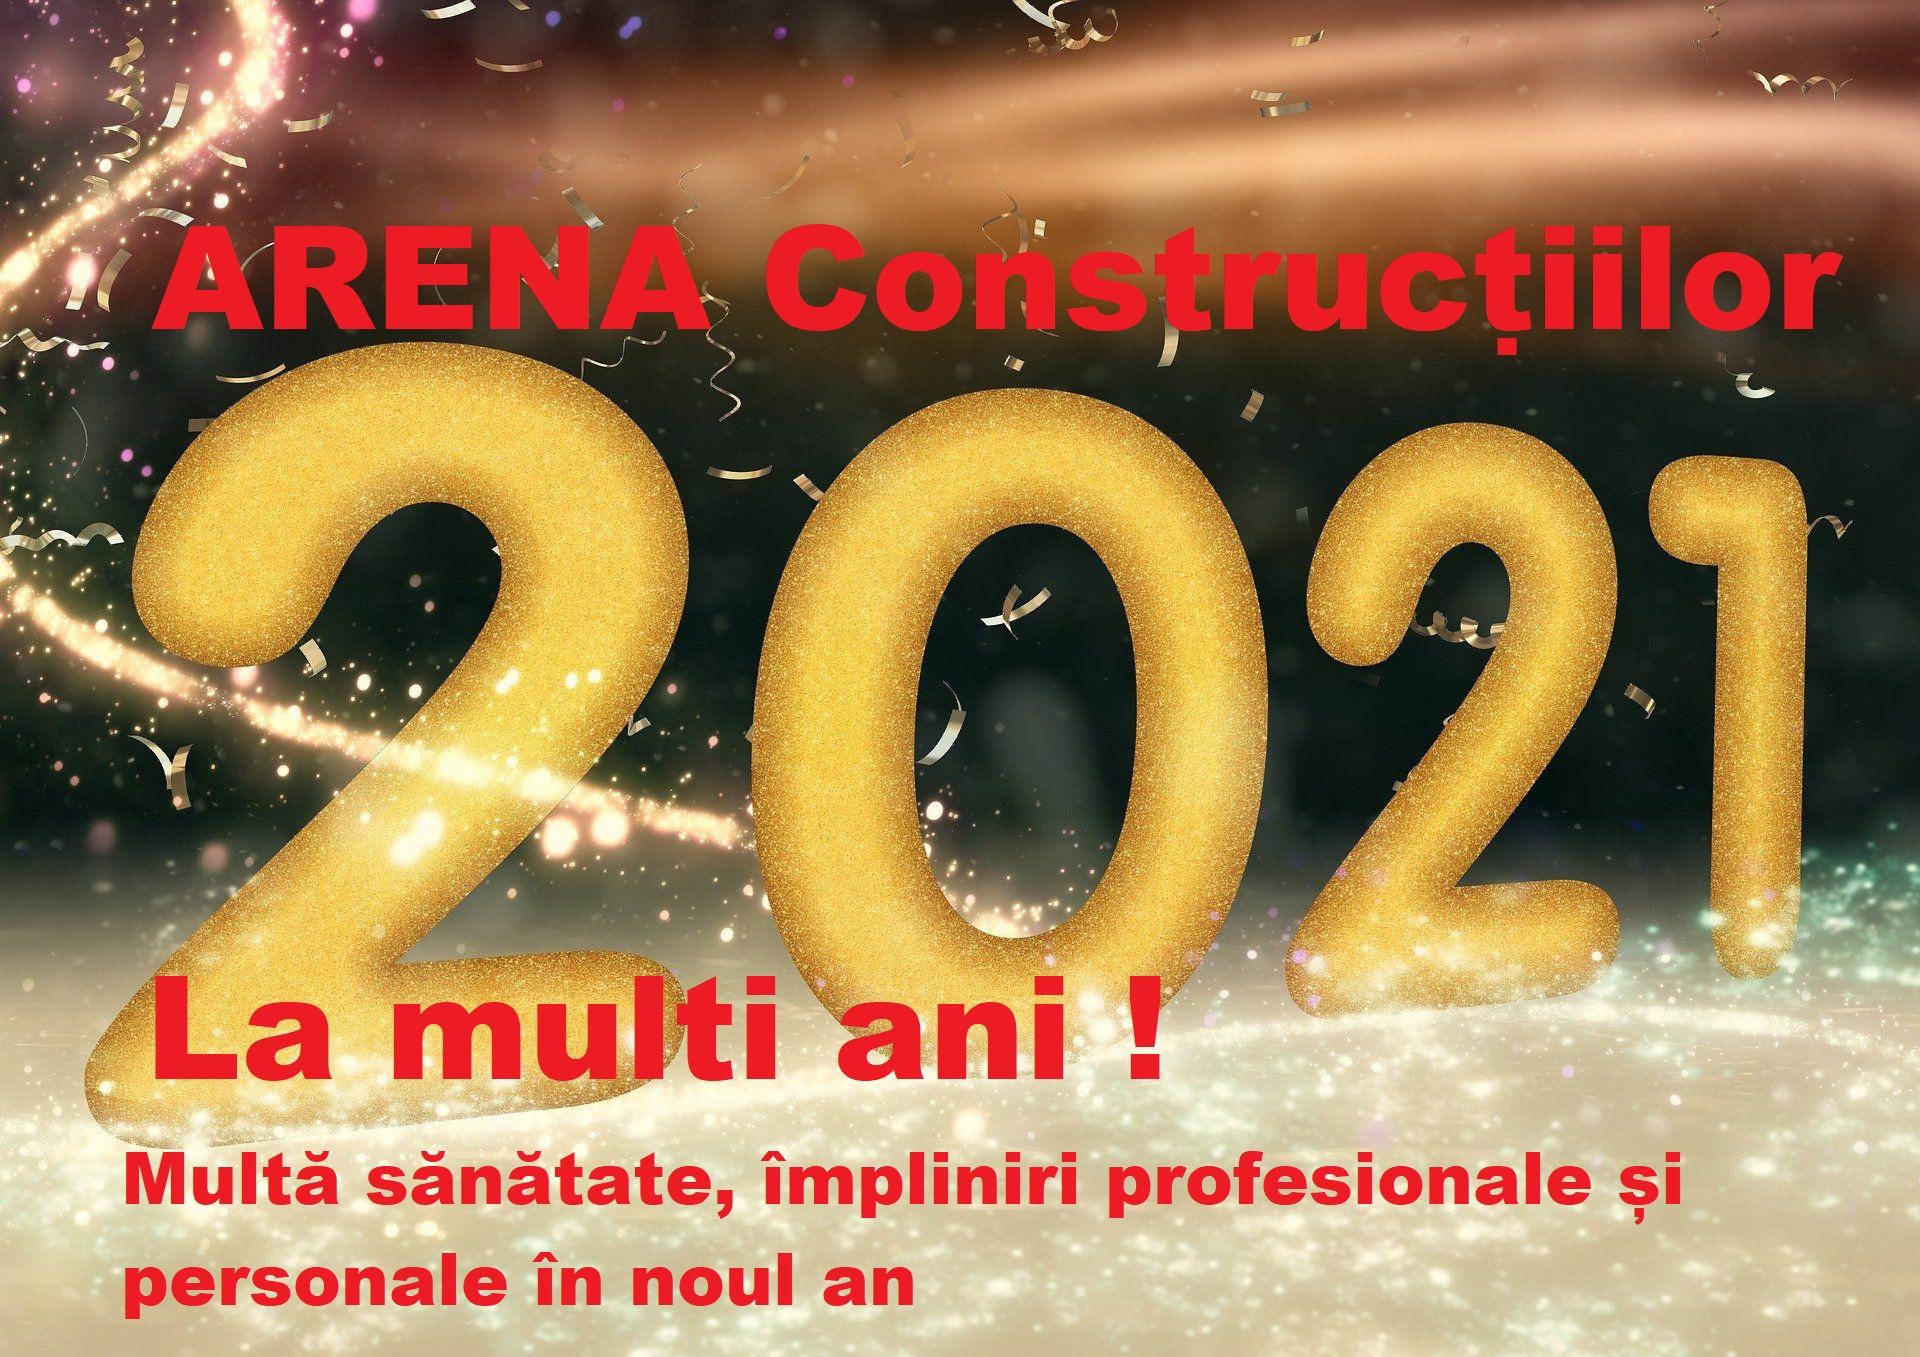 ARENA Constructiilor va ureaza La multi ani 2021!